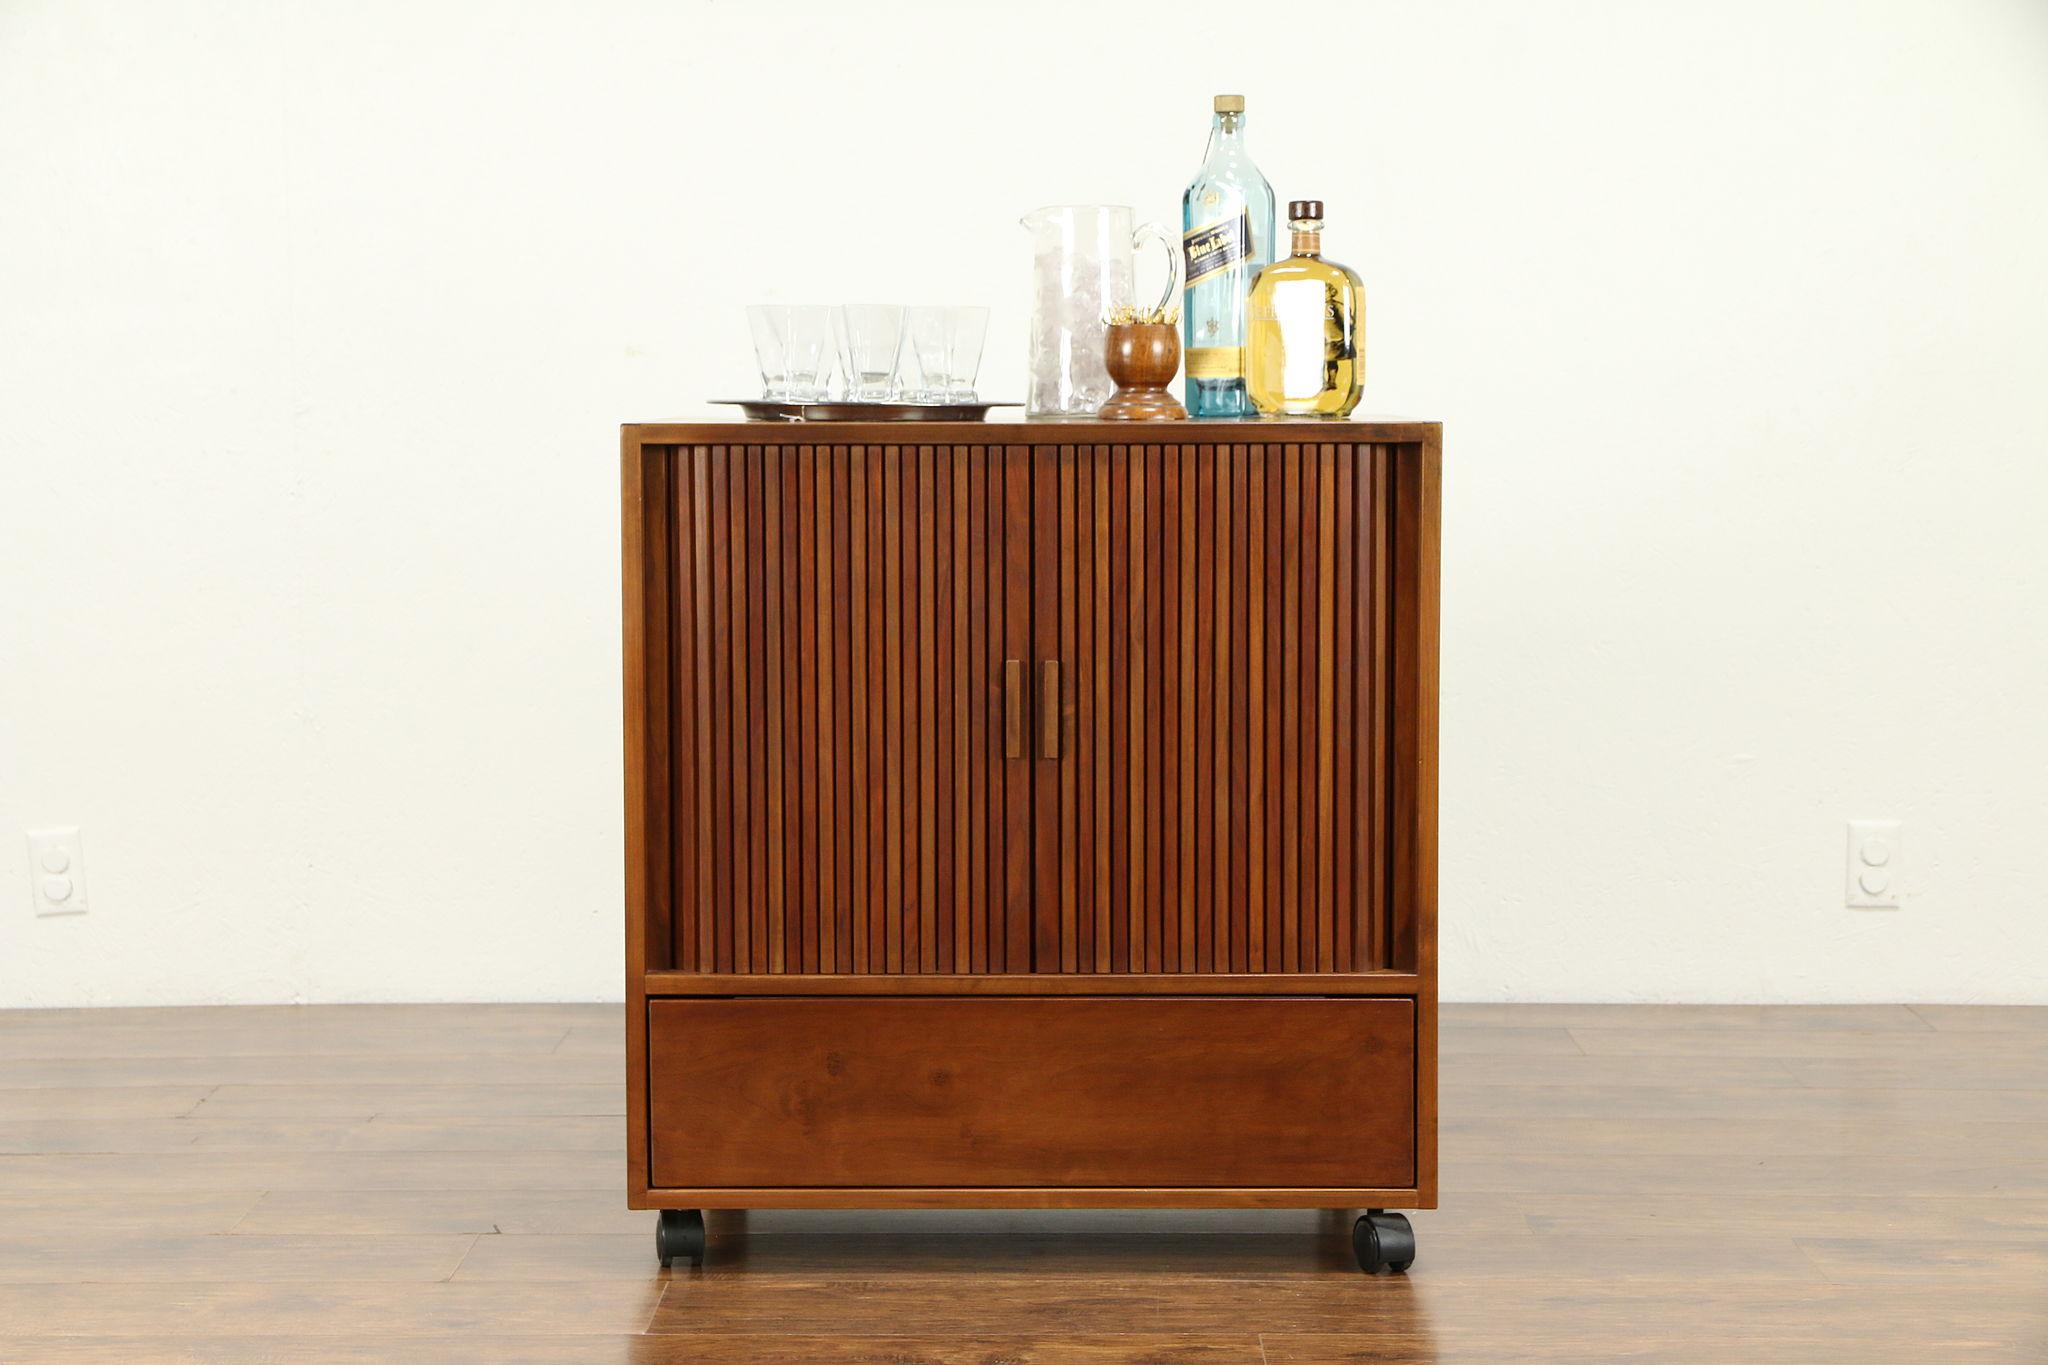 Sold Midcentury Modern Vintage Cherry Entertainment Bar Cabinet